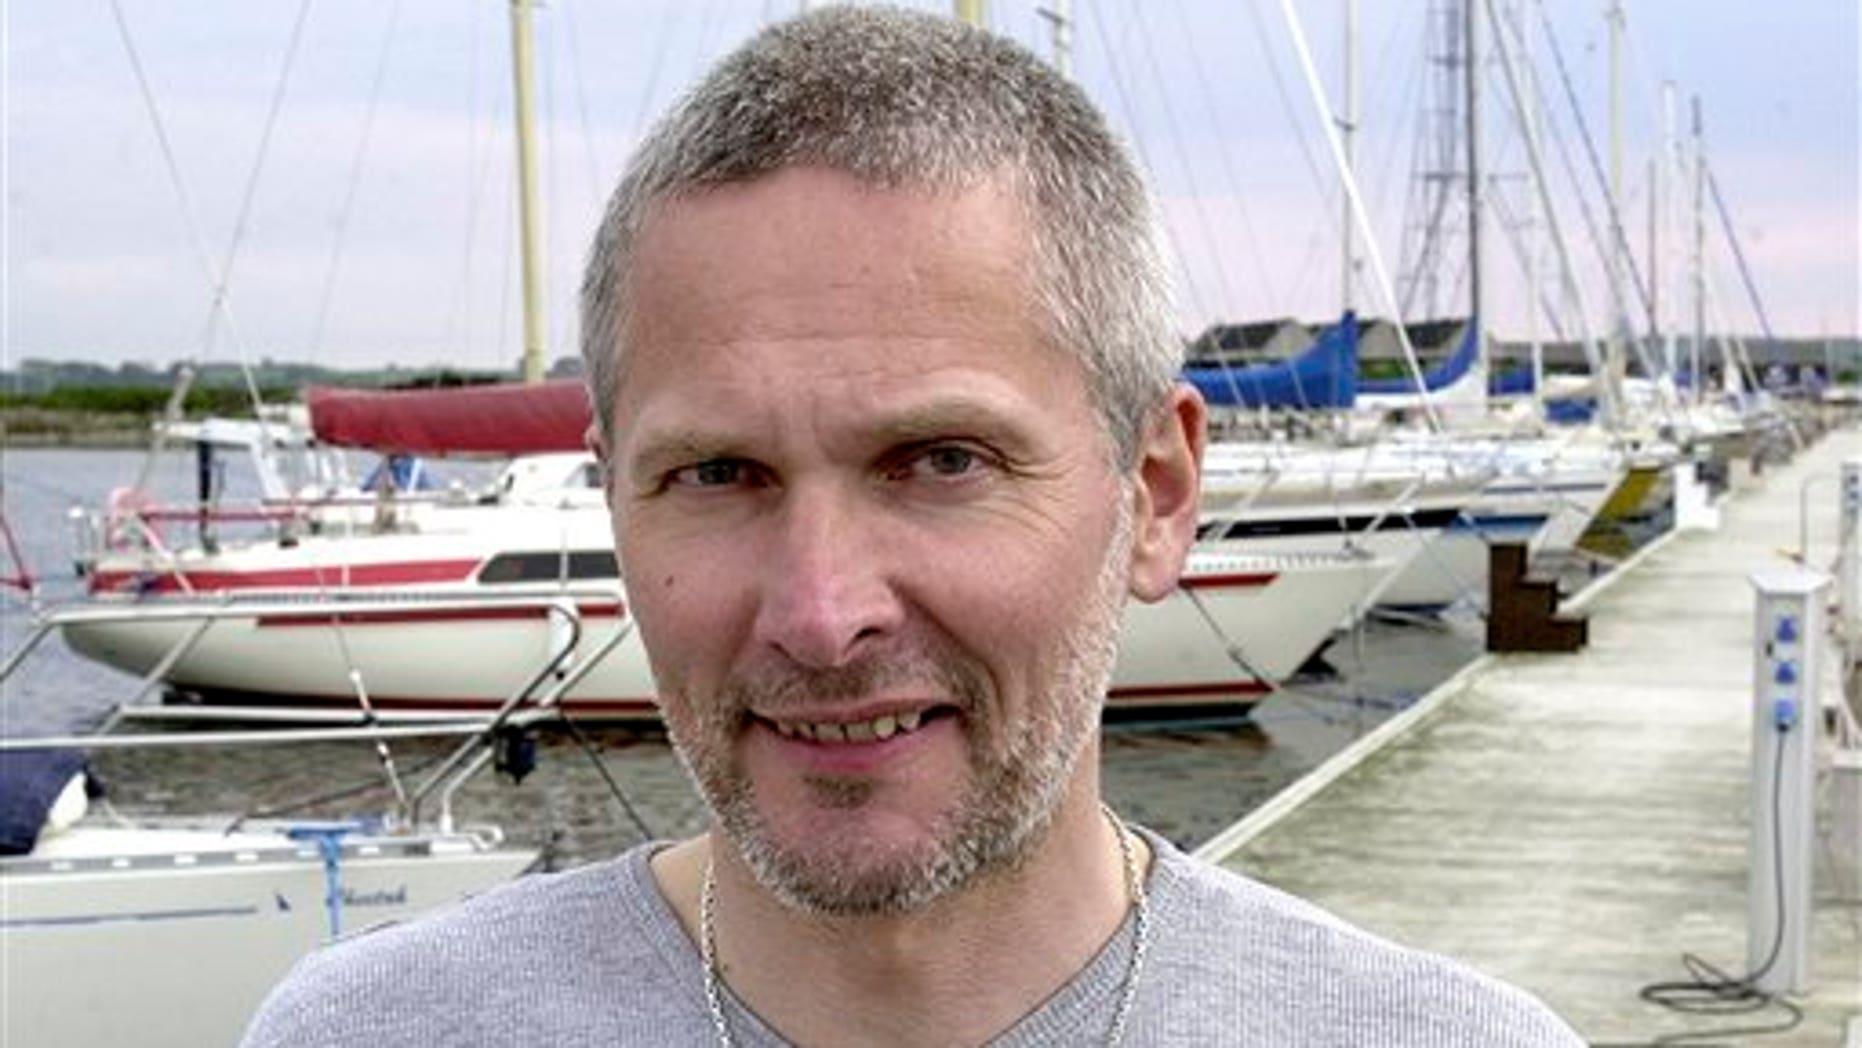 May 2004: Jan Quist Johansen in the harbor of Kalundborg, Denmark.